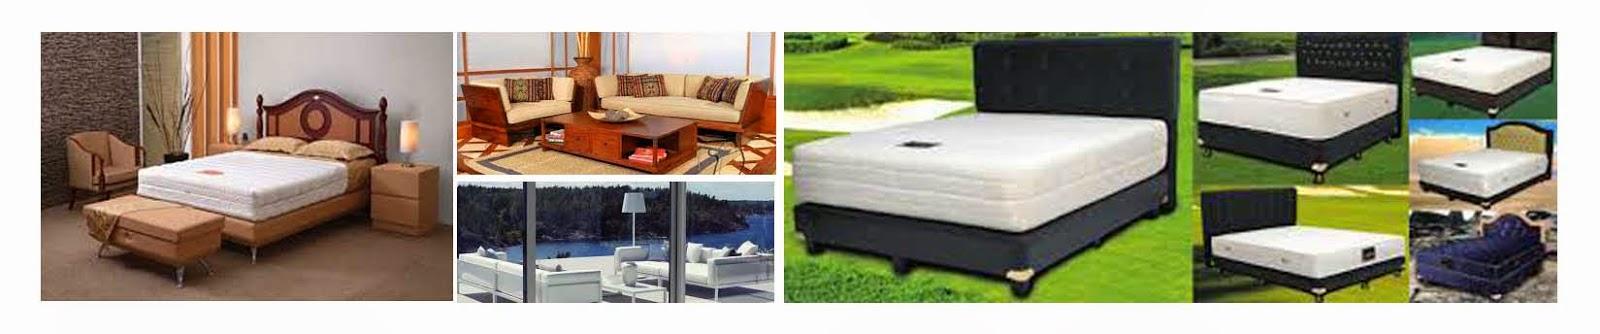 Sofa murah di jakarta selatan Vastu home furniture jakarta